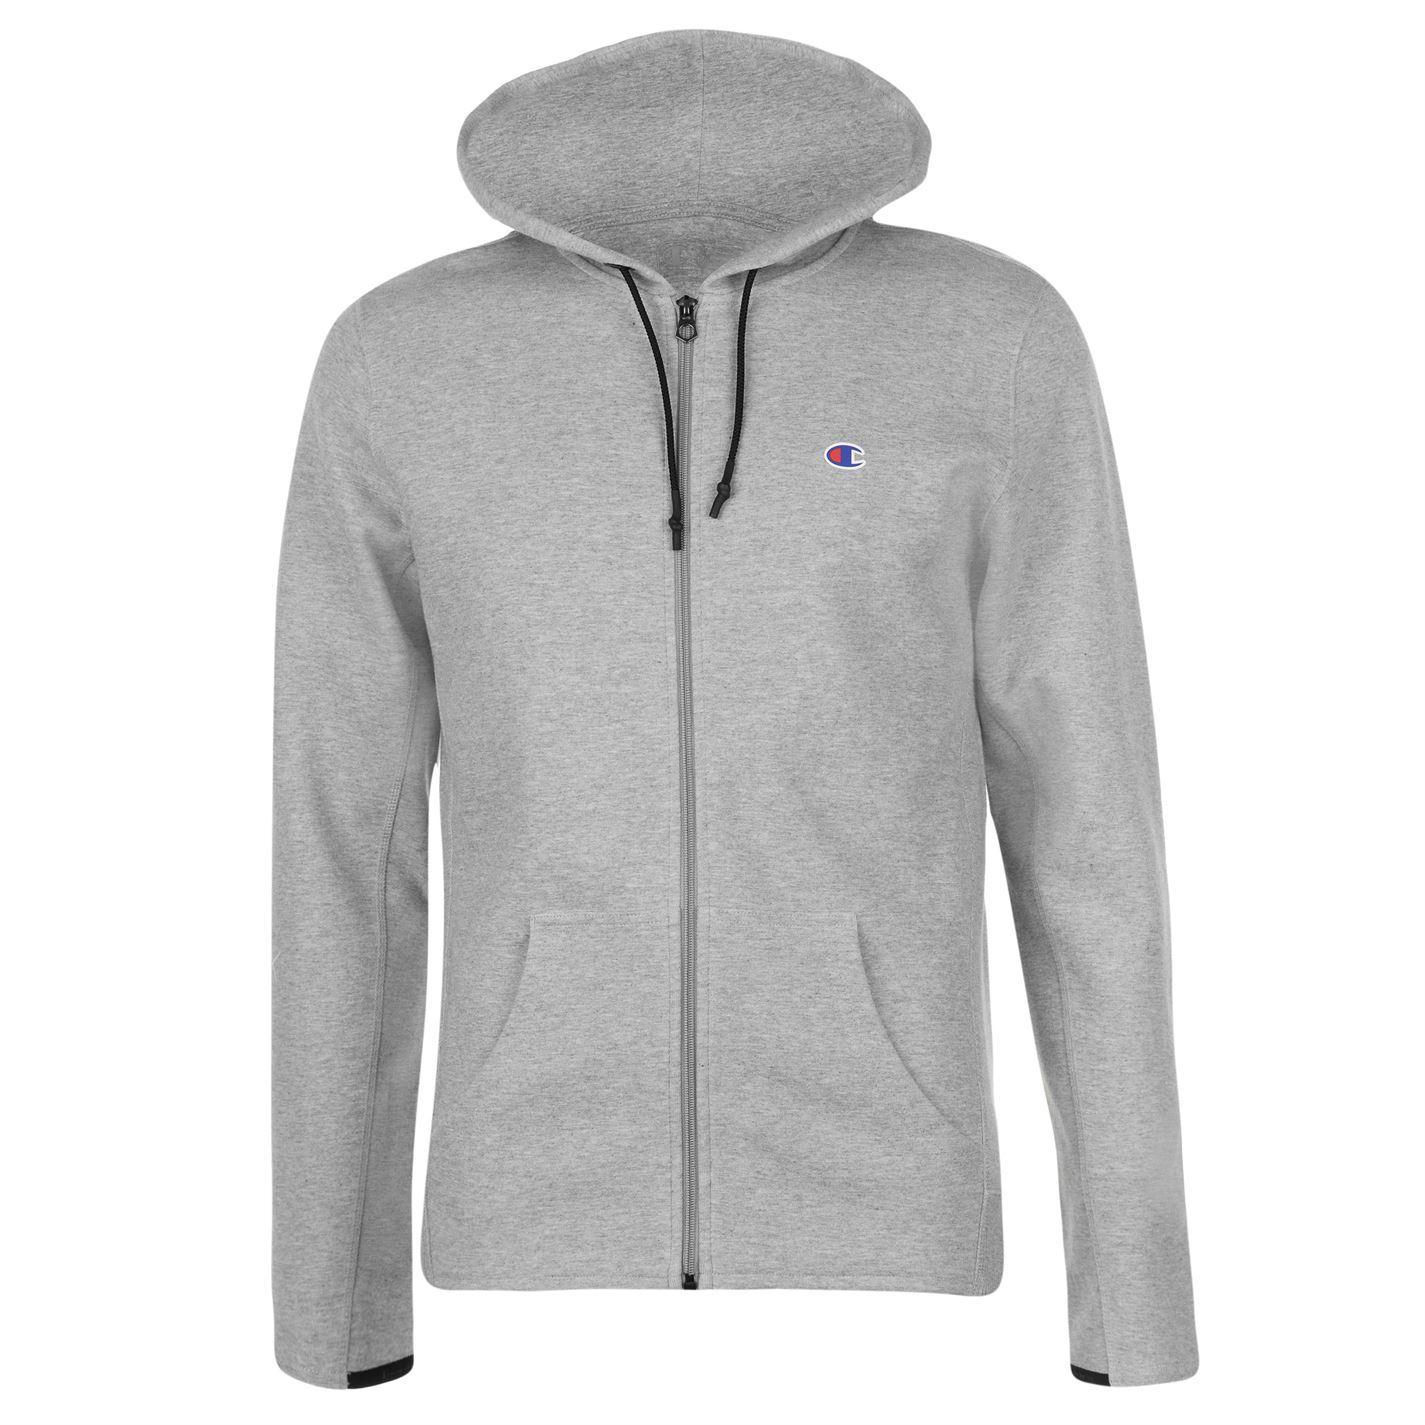 Champion-Interlock-Full-Zip-Hoody-Mens-Hoodie-Top-Sweatshirt-Sweater thumbnail 12